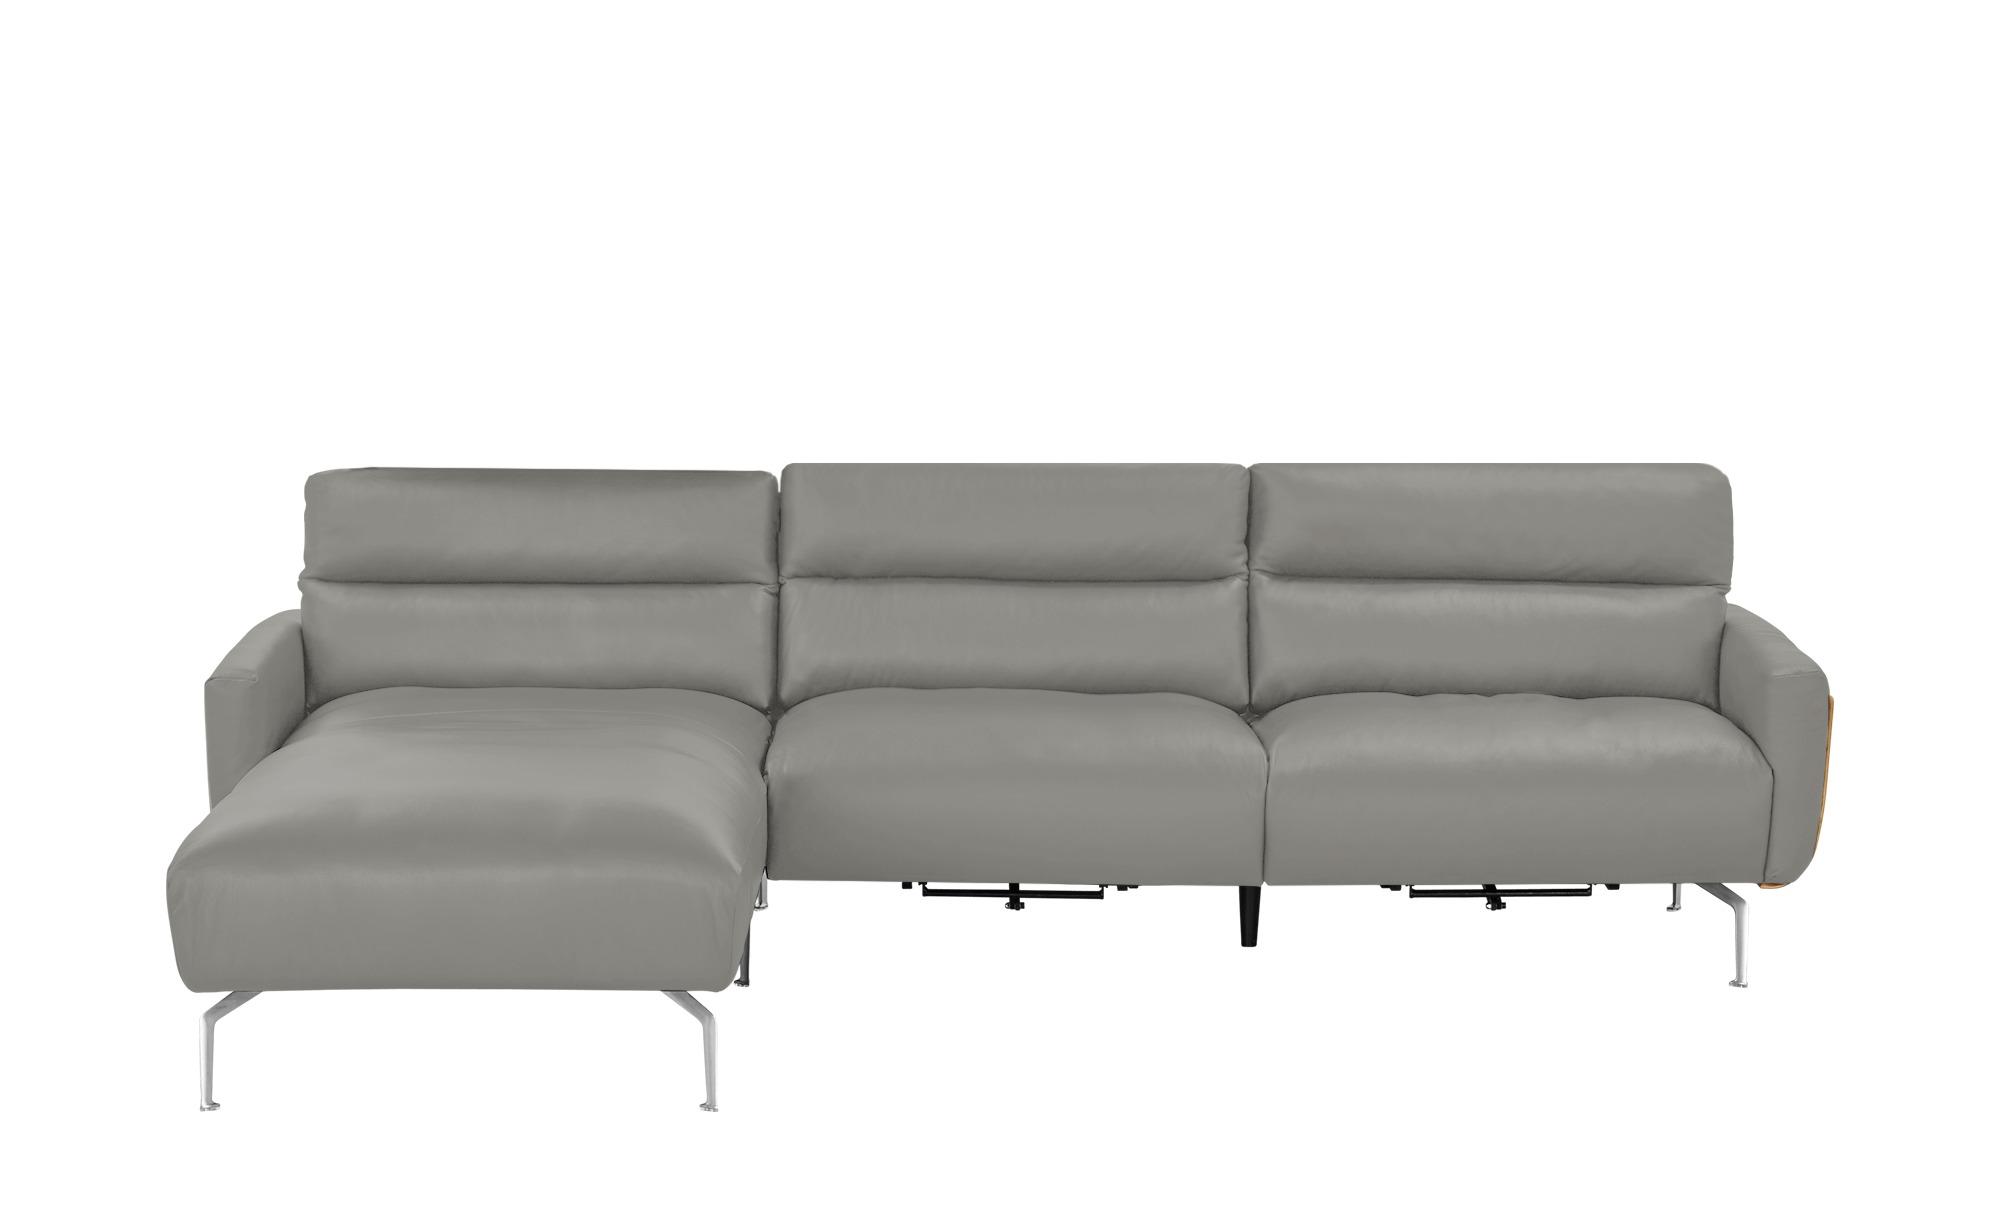 Ecksofa mads breite h he 90 cm grau online kaufen bei woonio for Ecksofa breite 200 cm